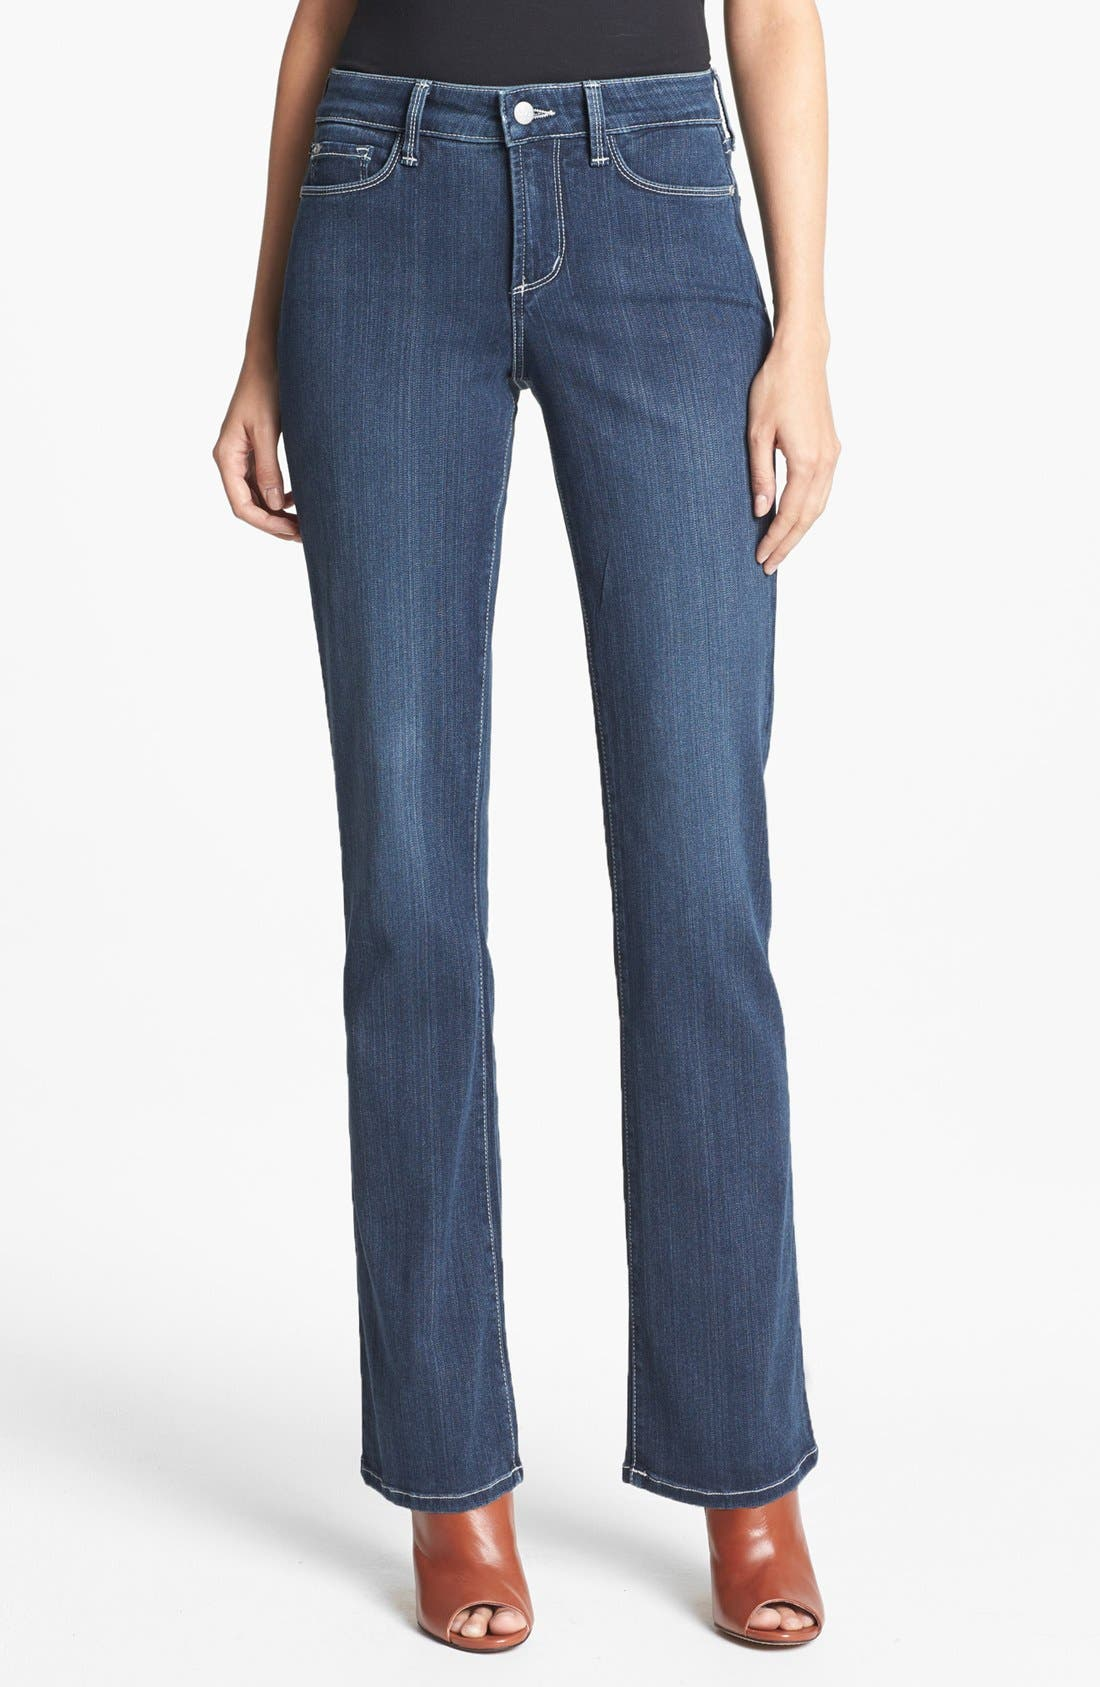 Main Image - NYDJ 'Barbara' Stretch Bootcut Jeans (Coral Sea)